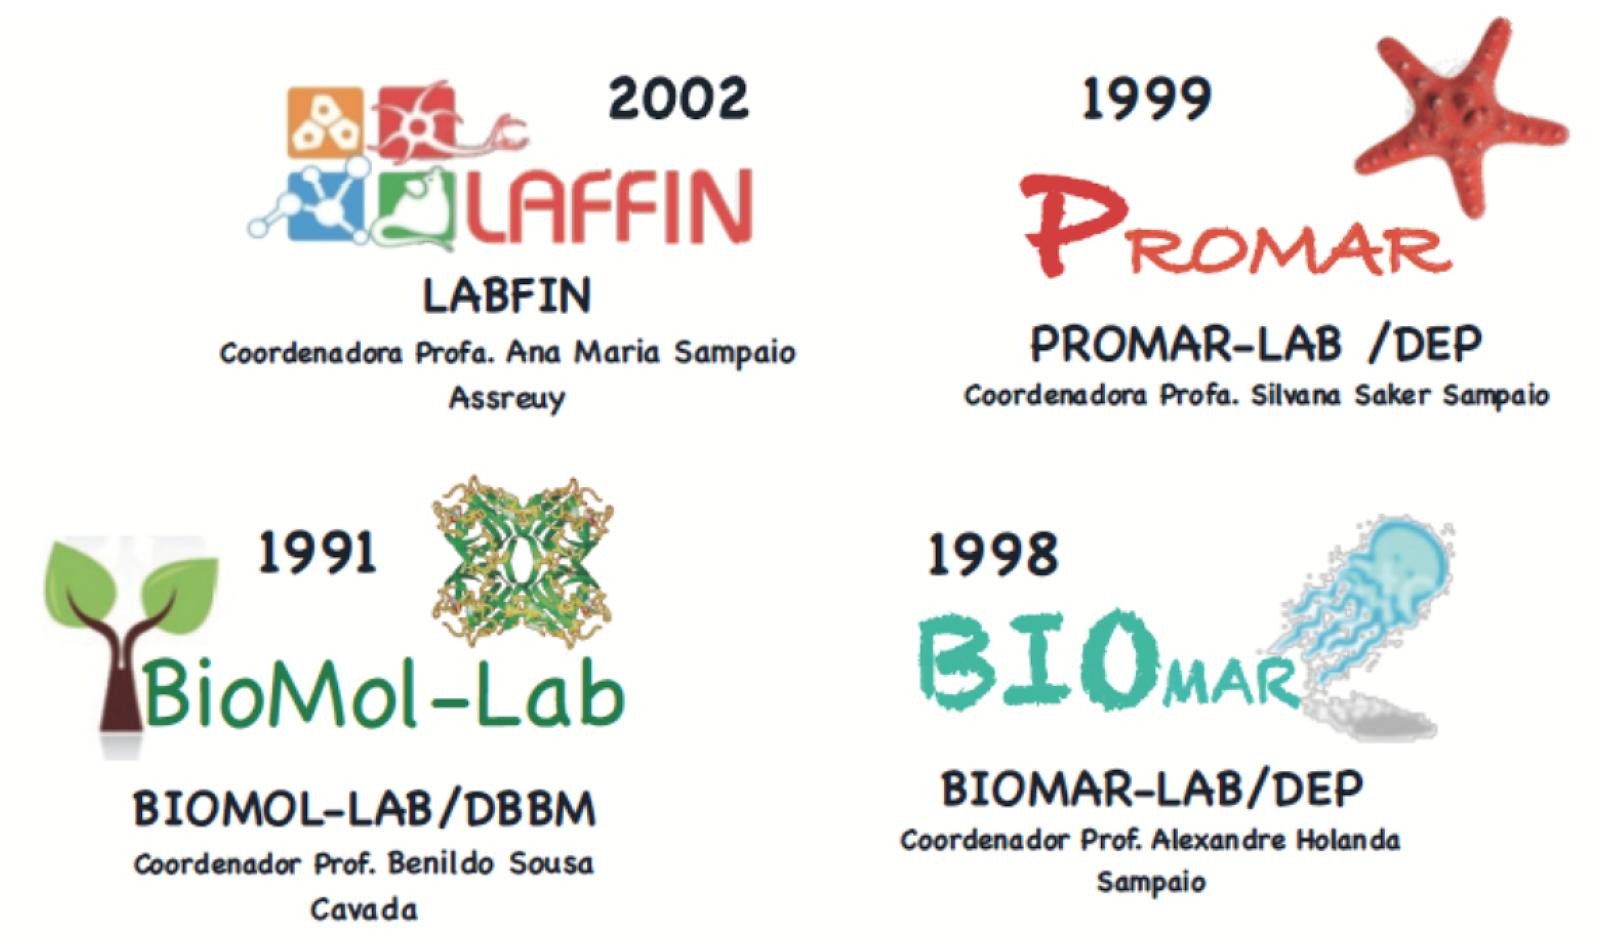 Biomol Group